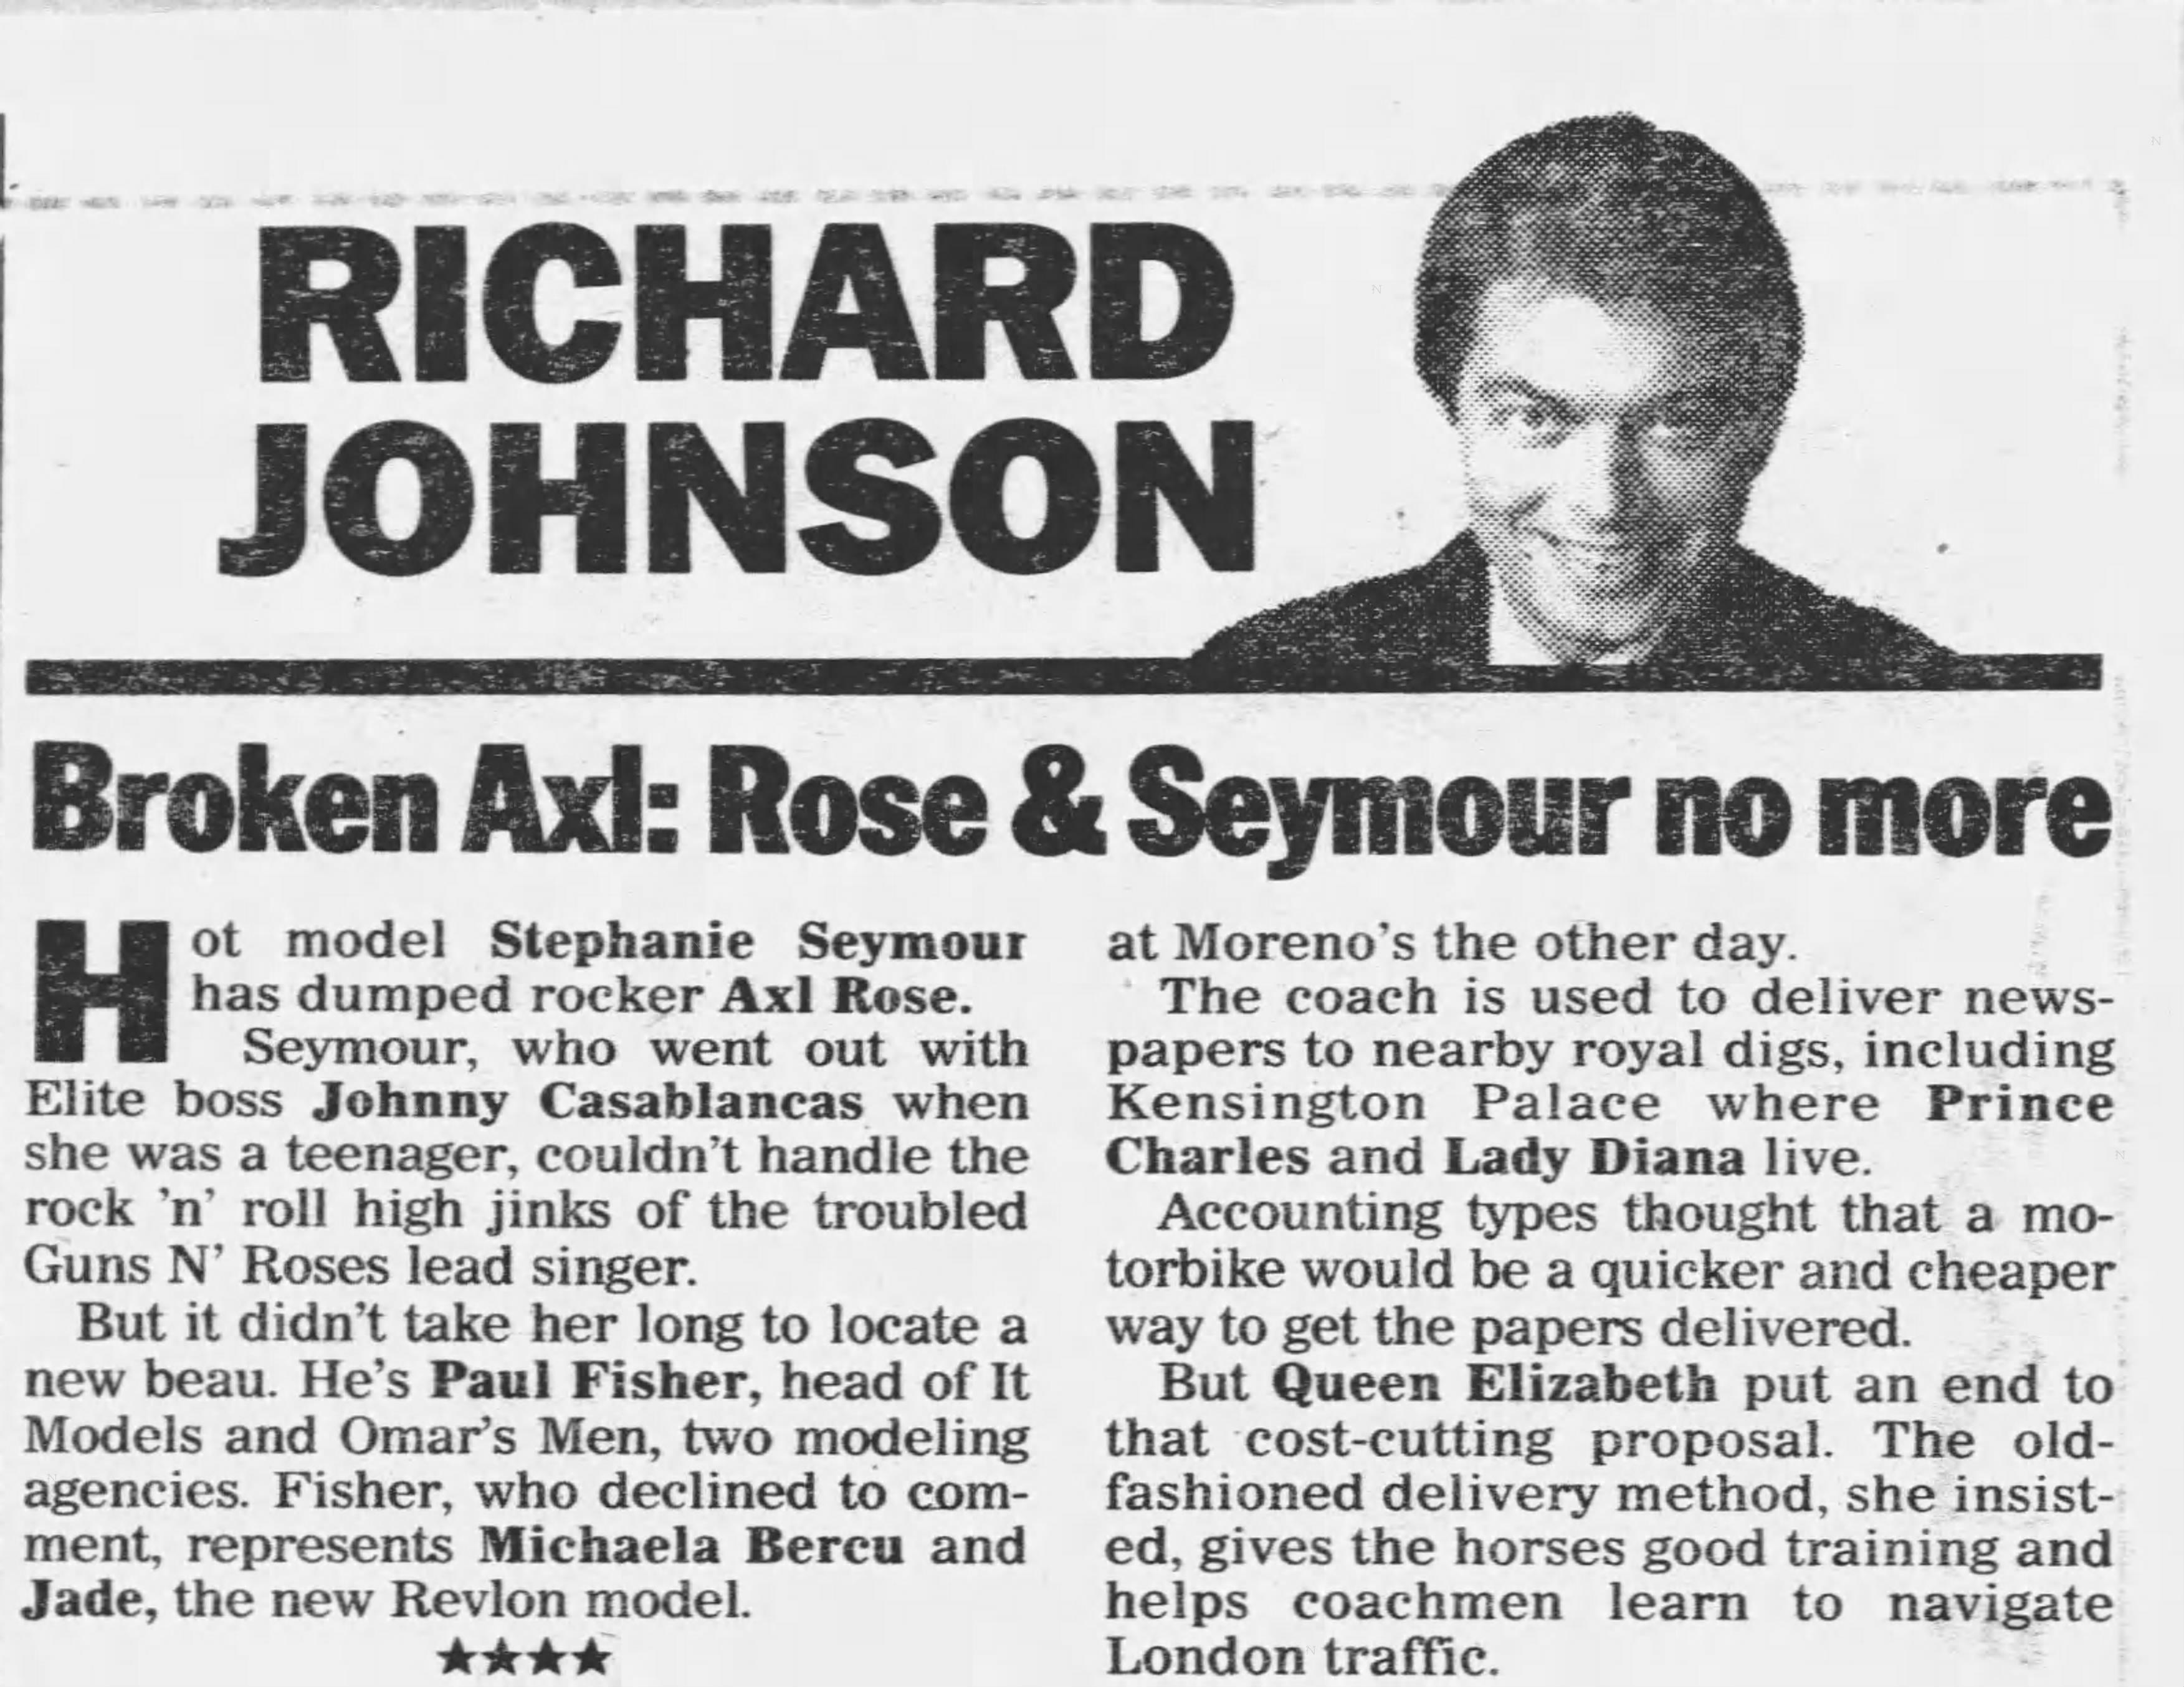 1991.12.11 - New York Daily News - Broken Axl B7KbDZWw_o